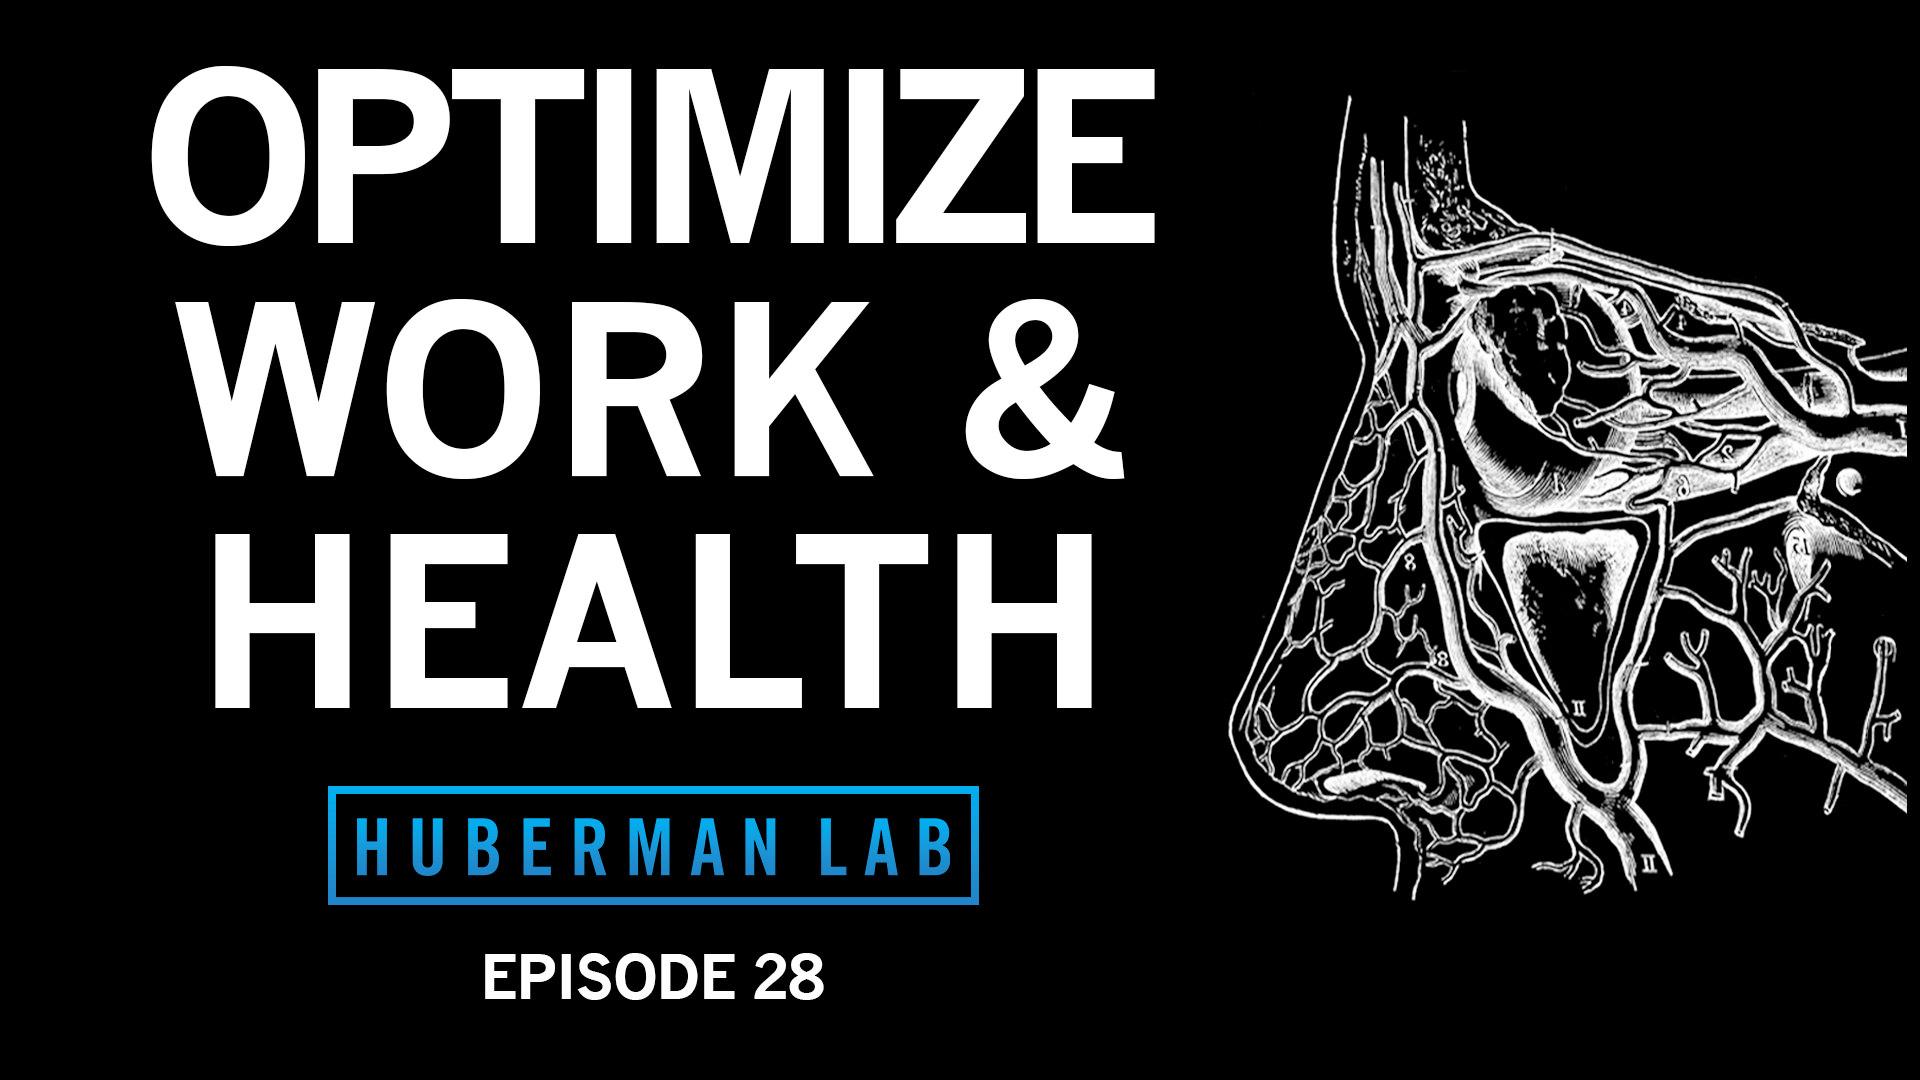 Huberman Lab Podcast Episode 28 Title Card